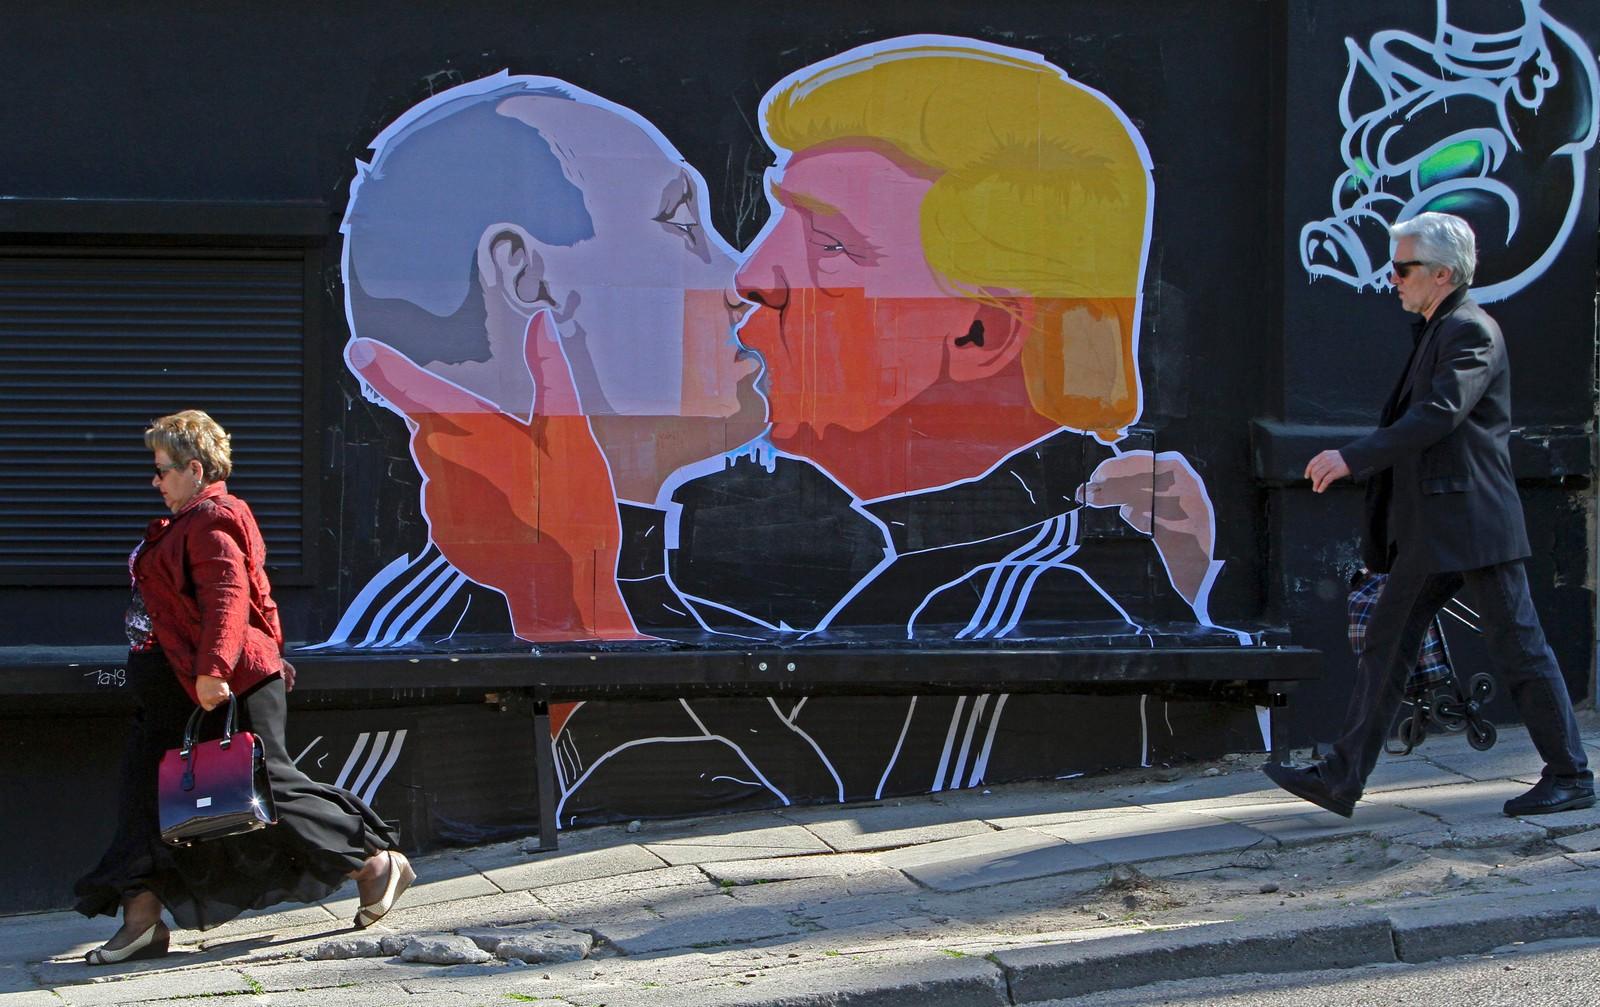 KYSS 1: I Litauens hovedstad Vilnius ble skapt et veggmaleri der Donald Trump kysser Russlands president Vladimir Putin.